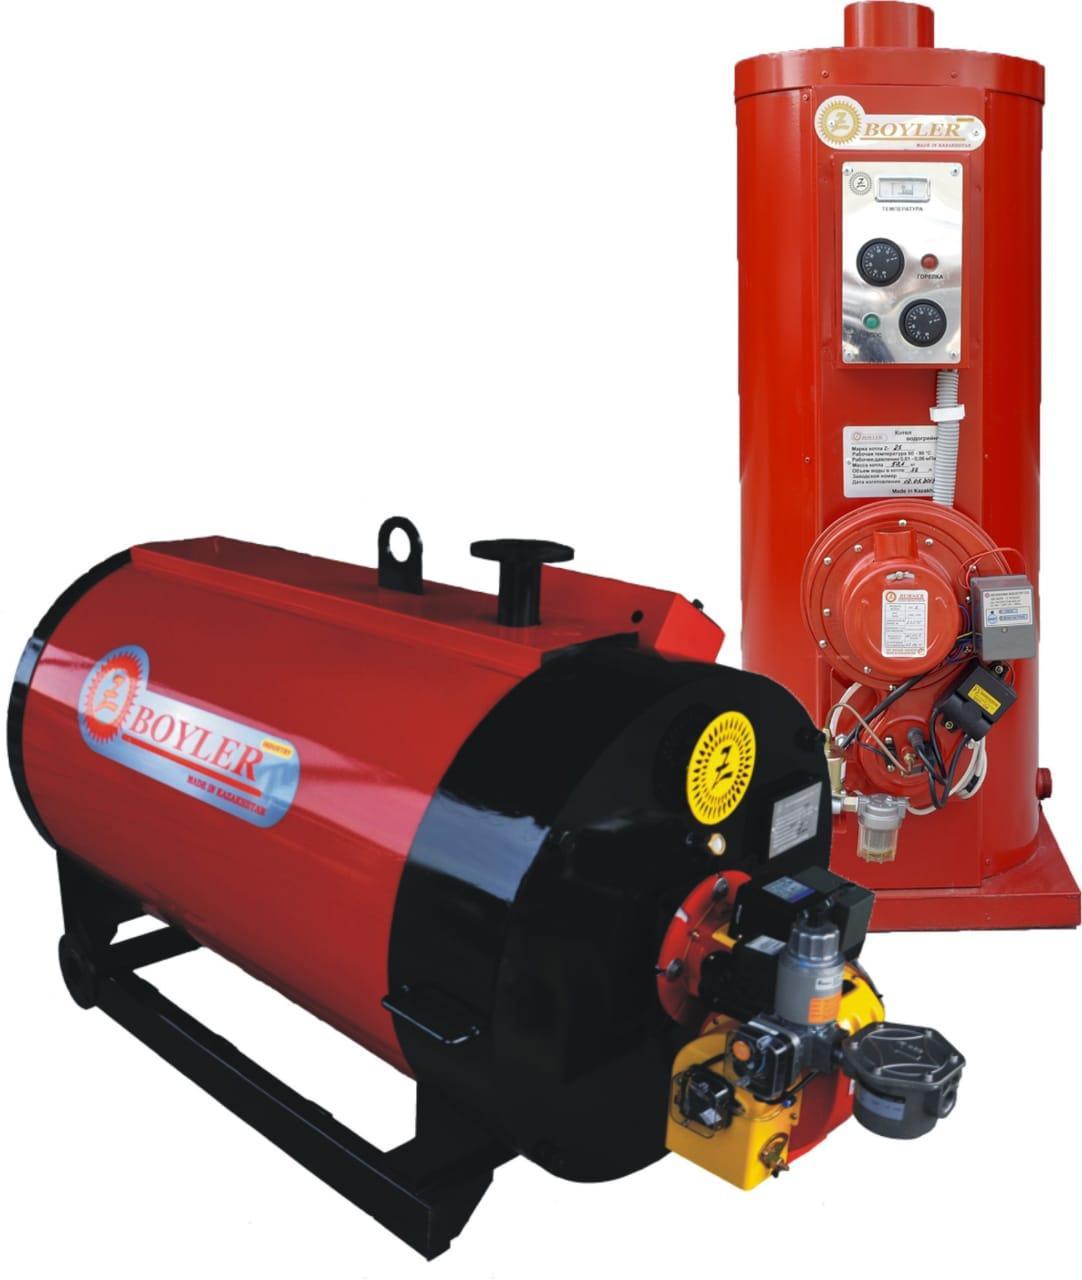 Напольные газовые котлы Z-150